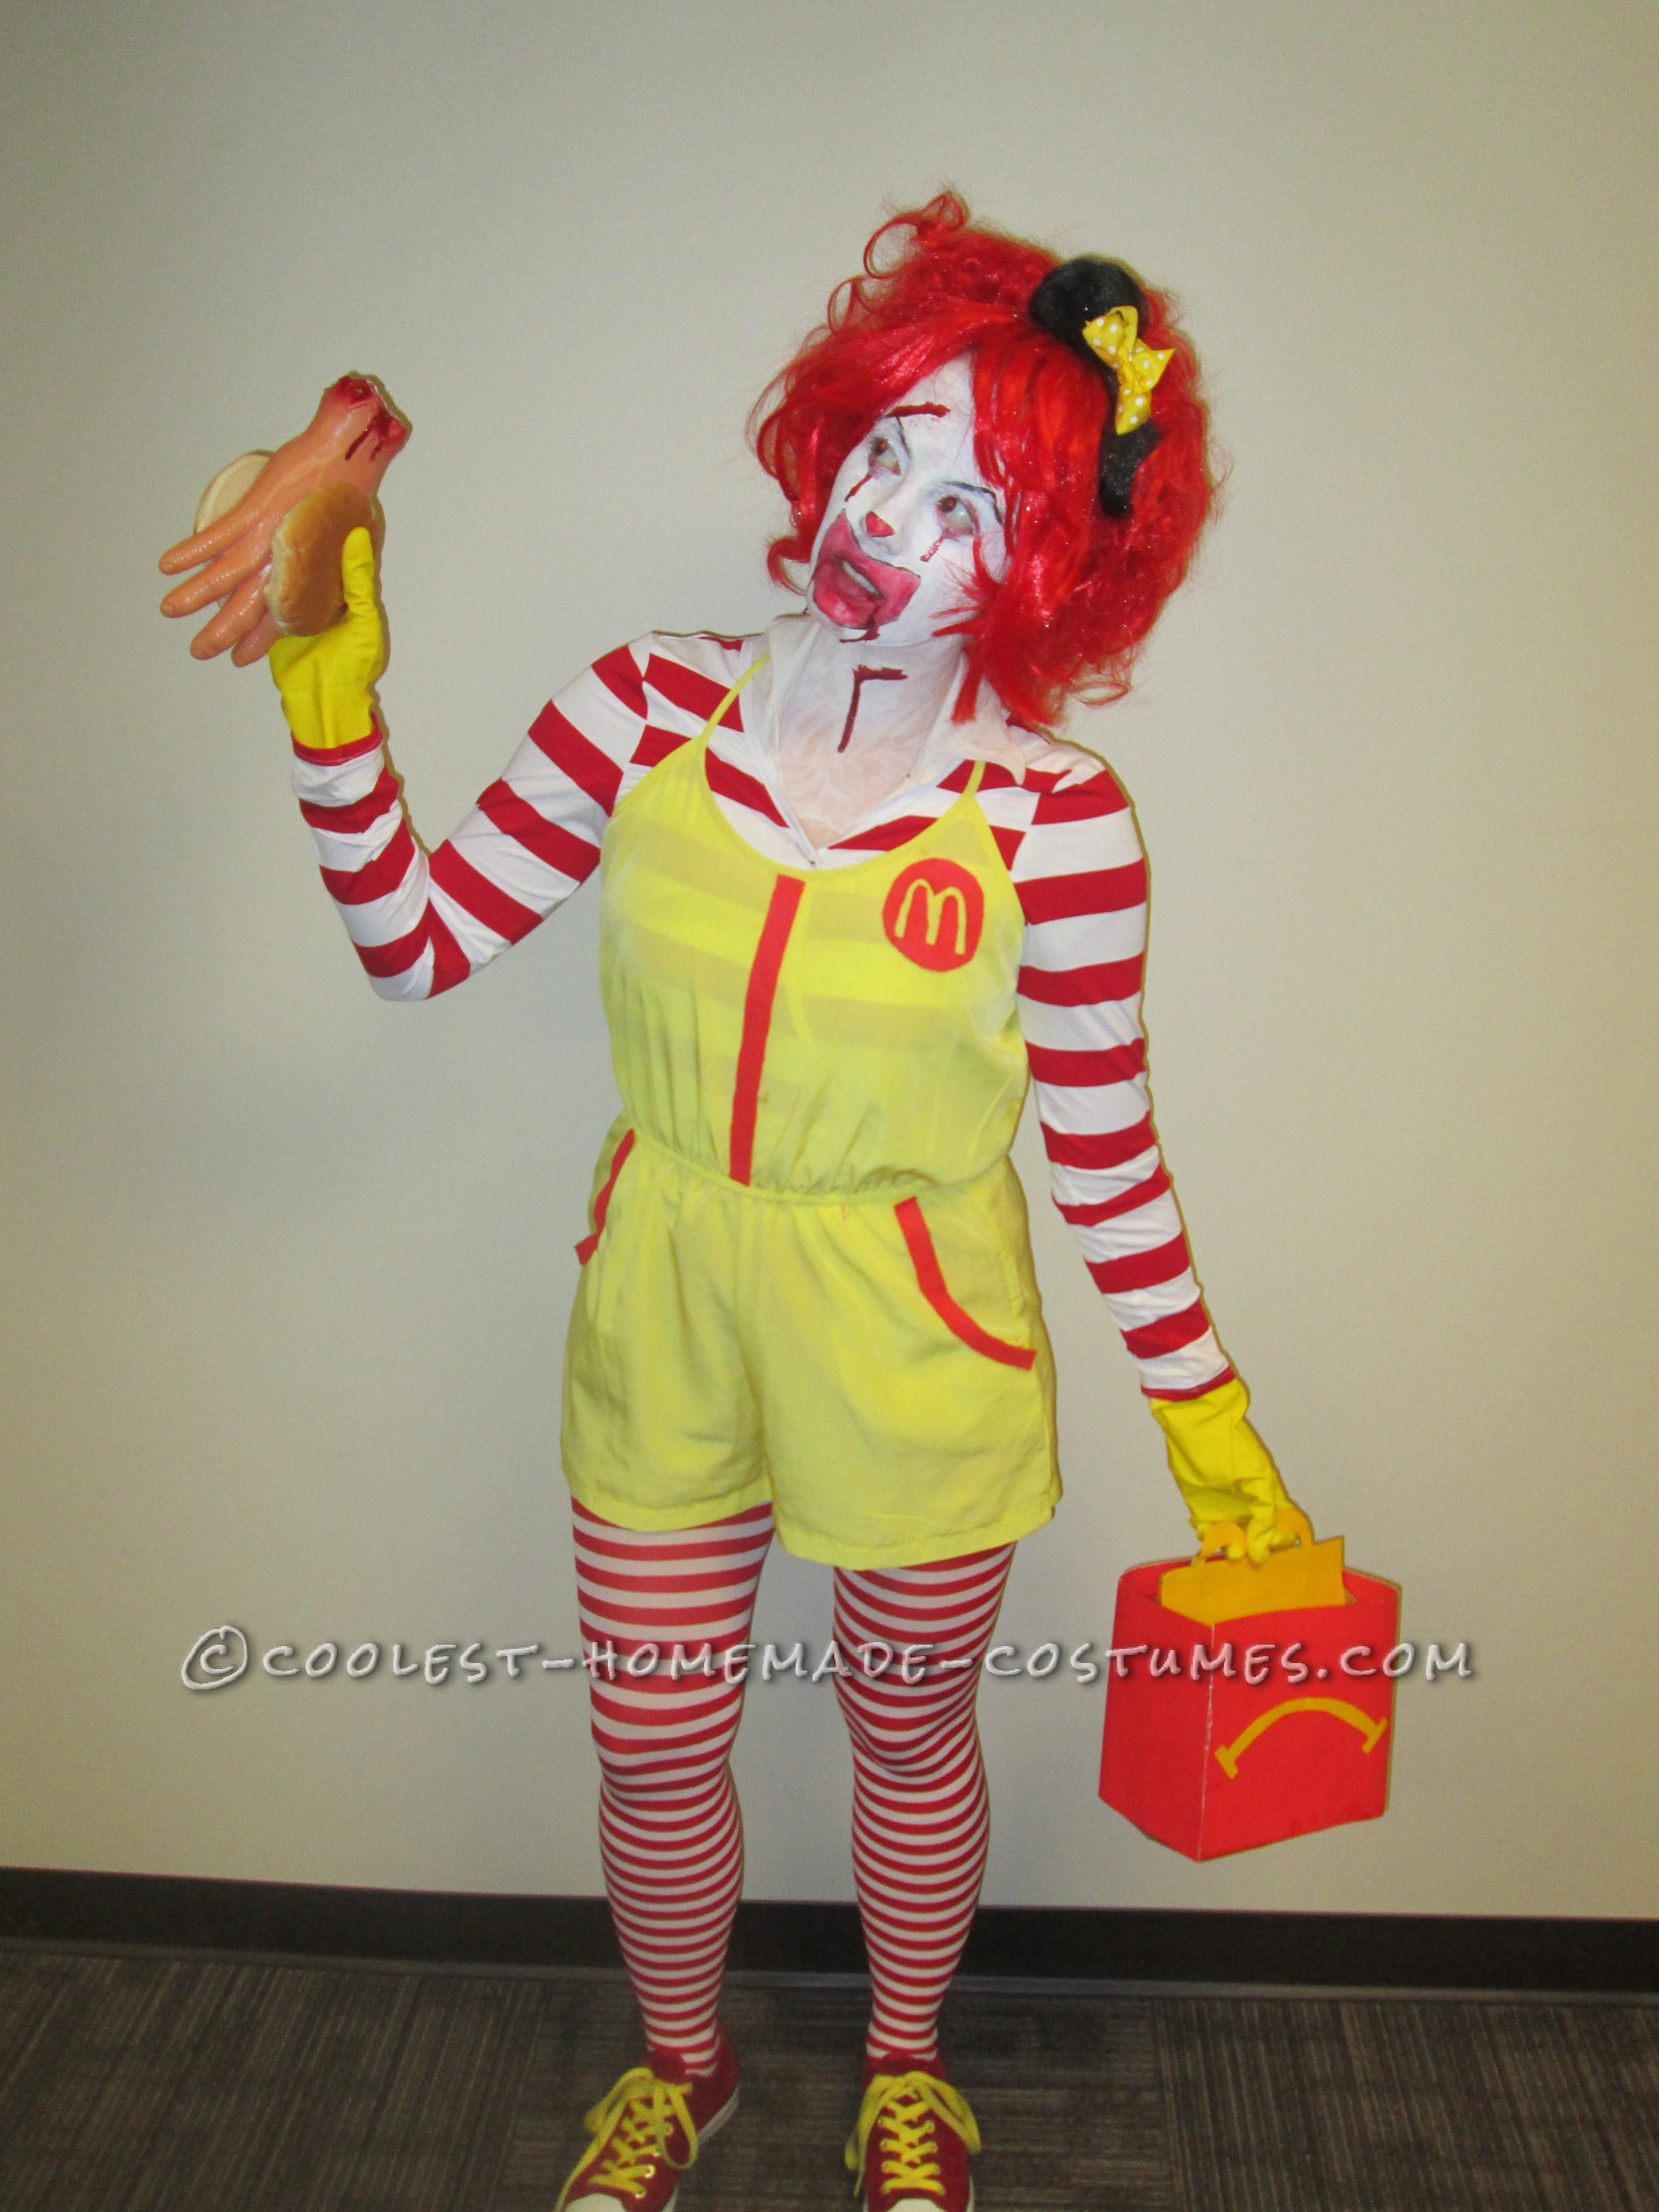 Super Creepy Serial Killer Ronald McDonald Costume